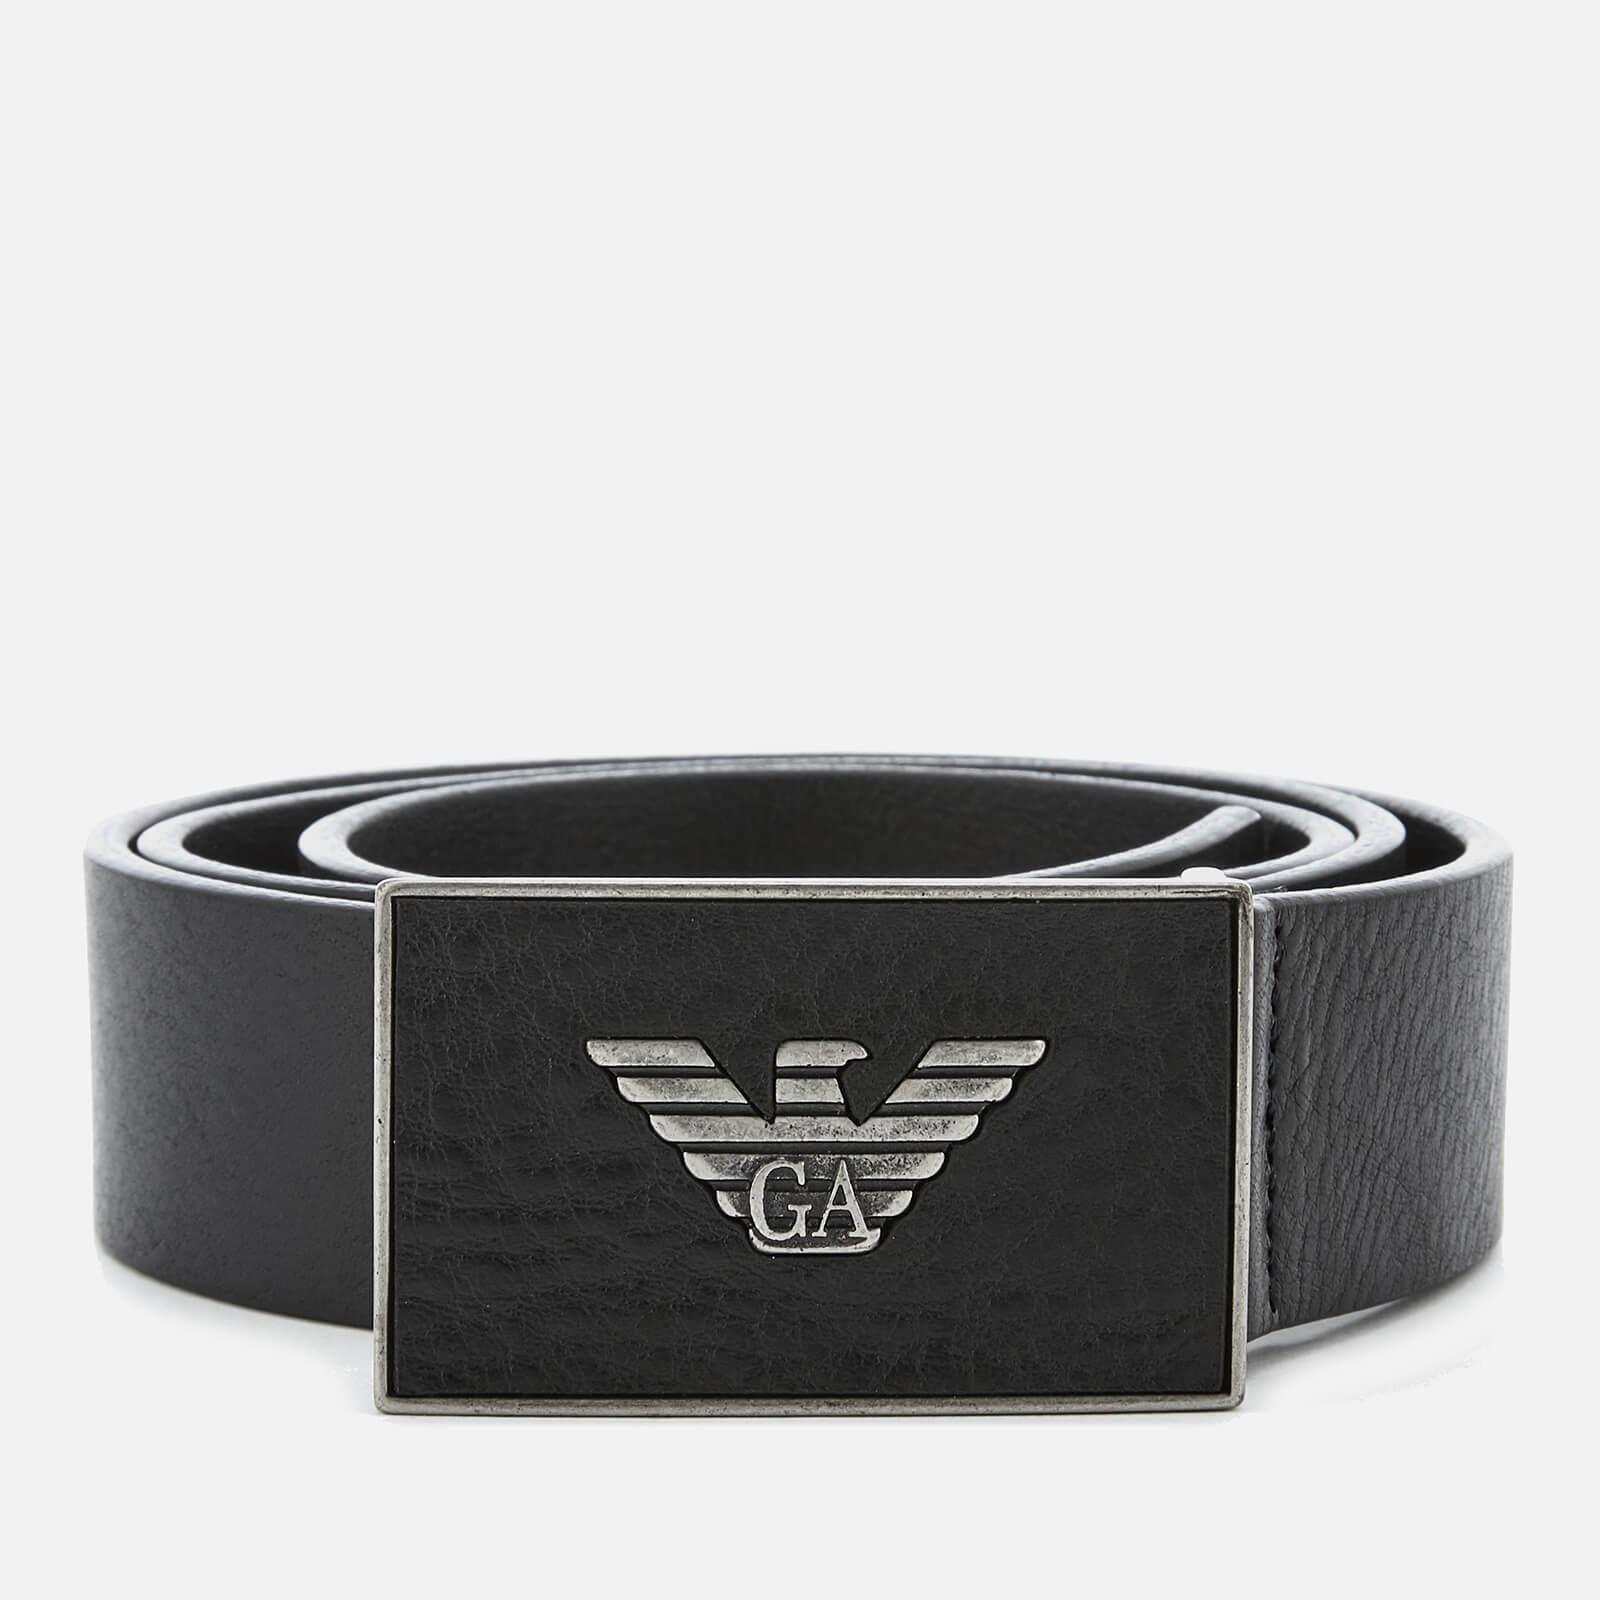 Emporio Armani s Plate Belt - Black - EU 90/W36 - Black